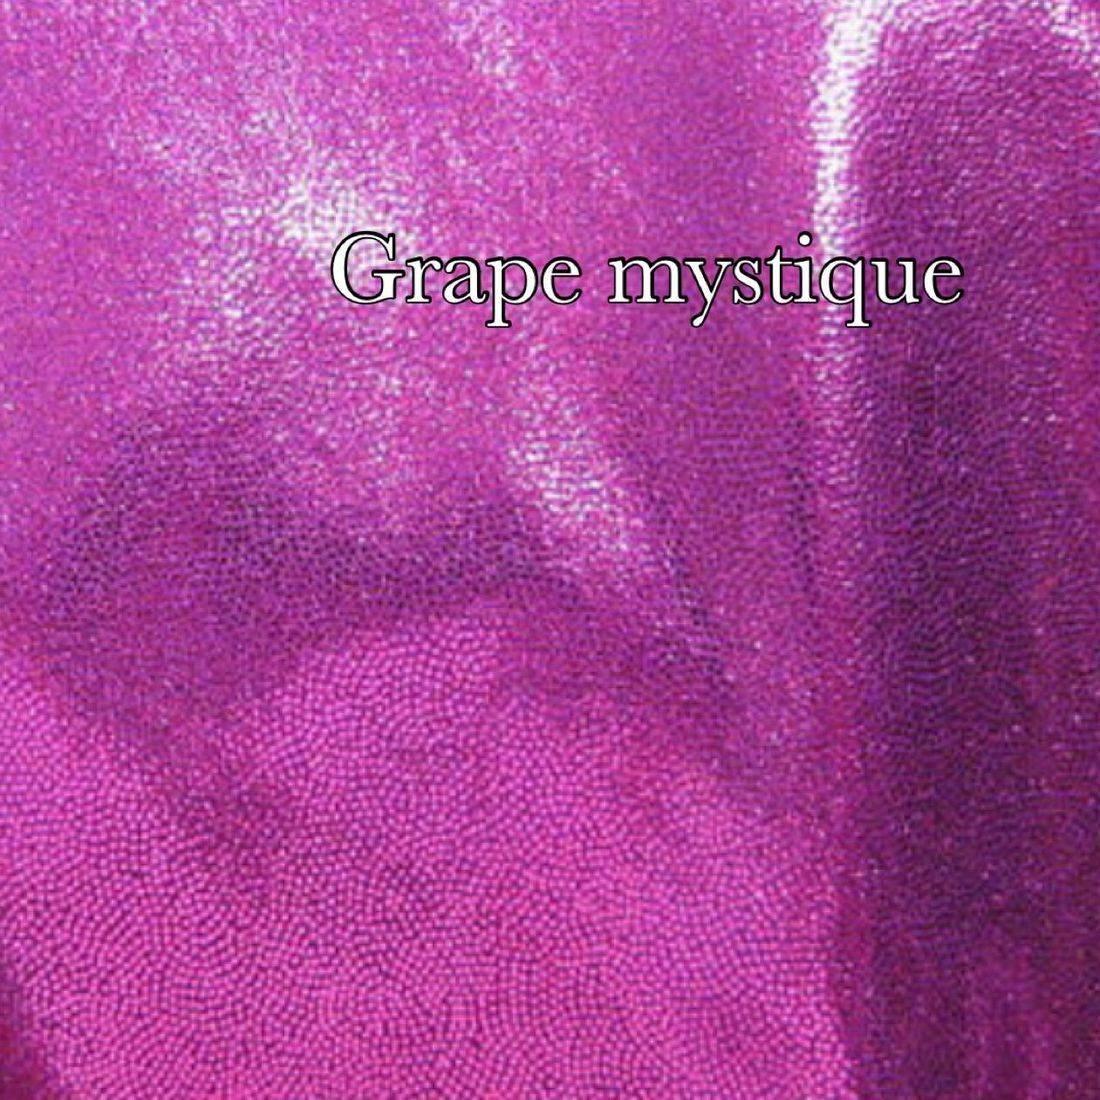 Grape mist